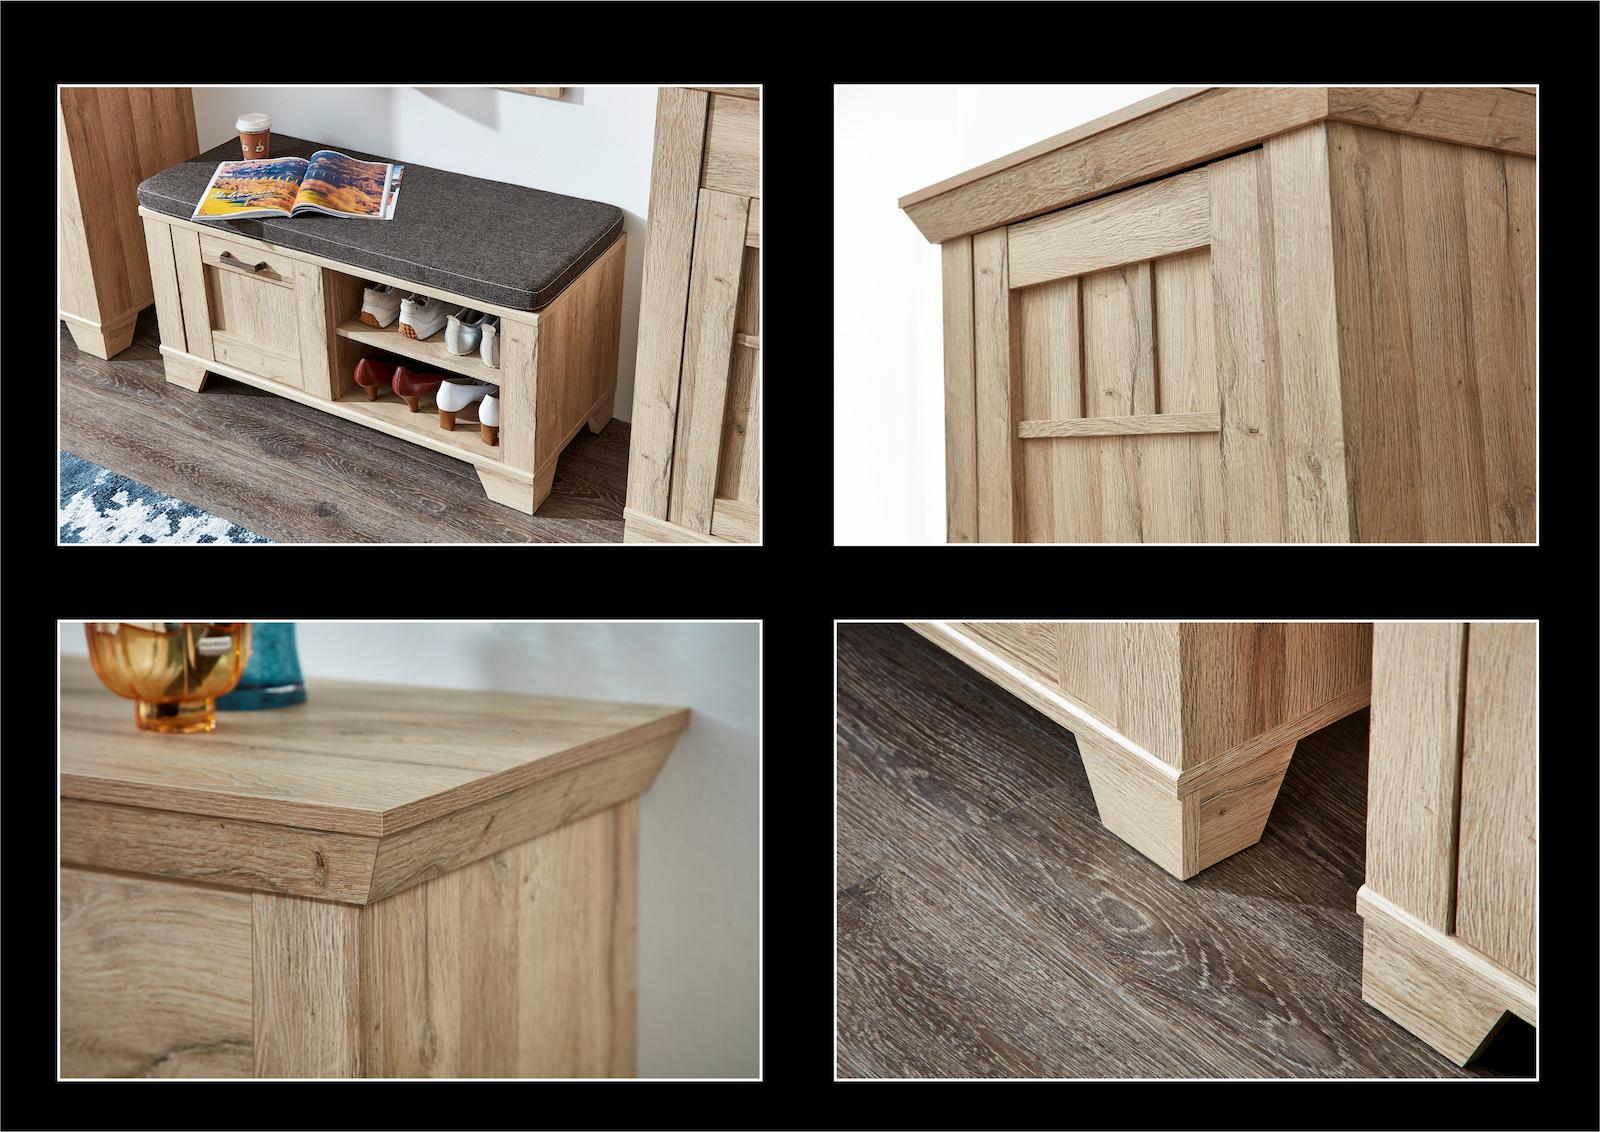 spiegel malm eiche hell diele flur wandspiegel. Black Bedroom Furniture Sets. Home Design Ideas